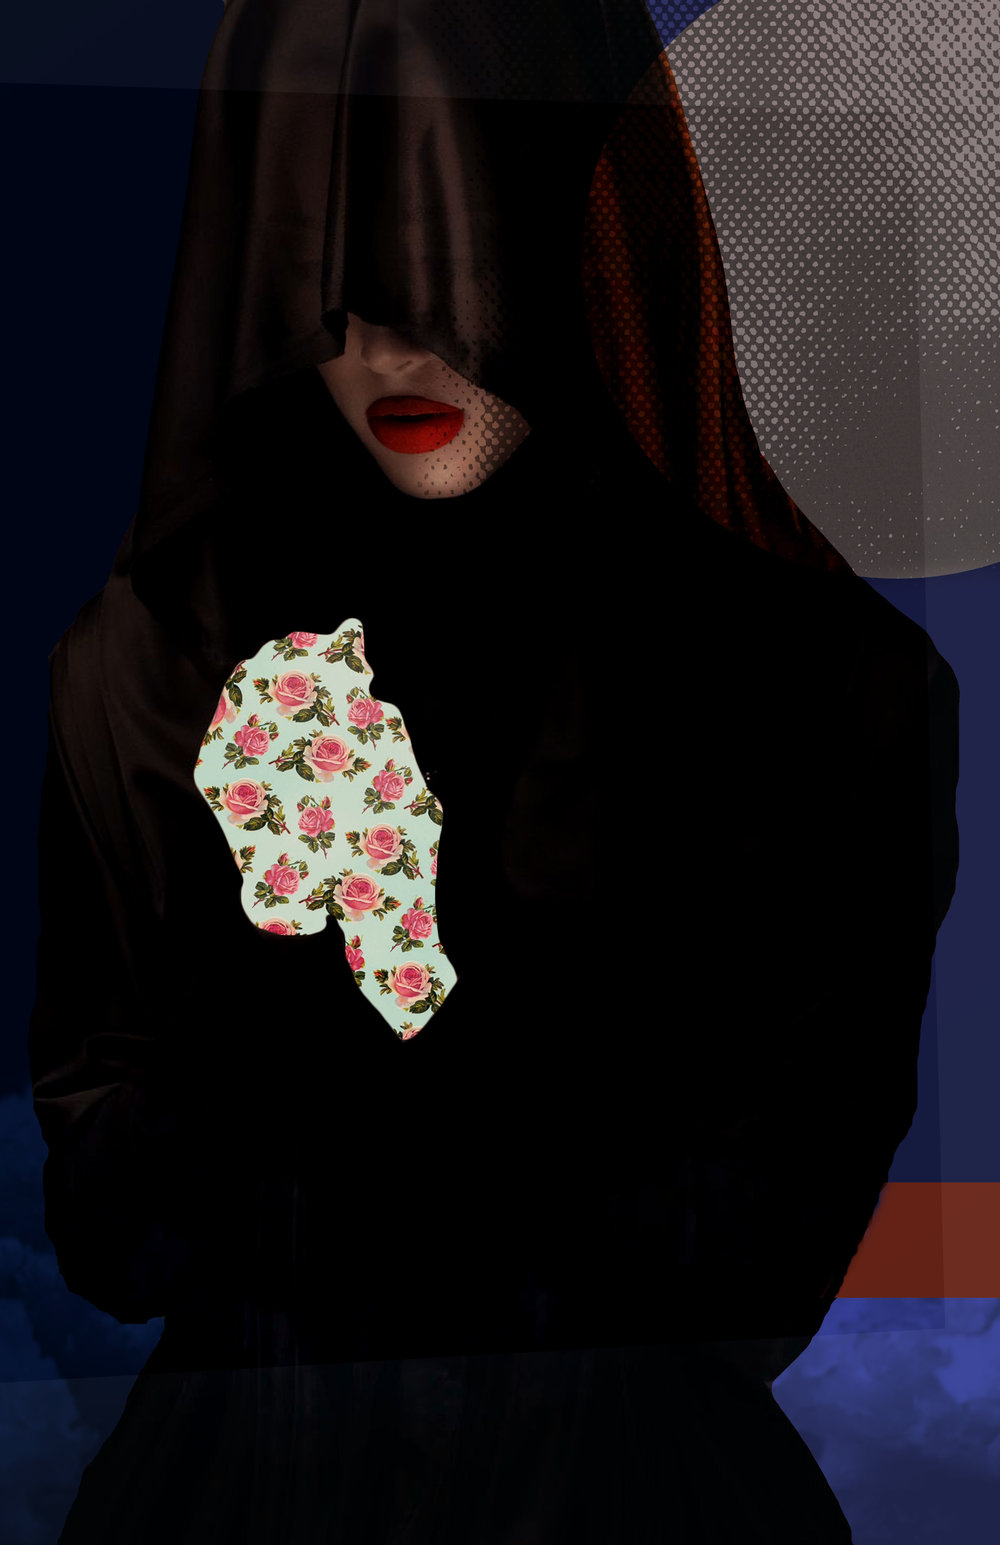 GothGirl_Collage.jpg